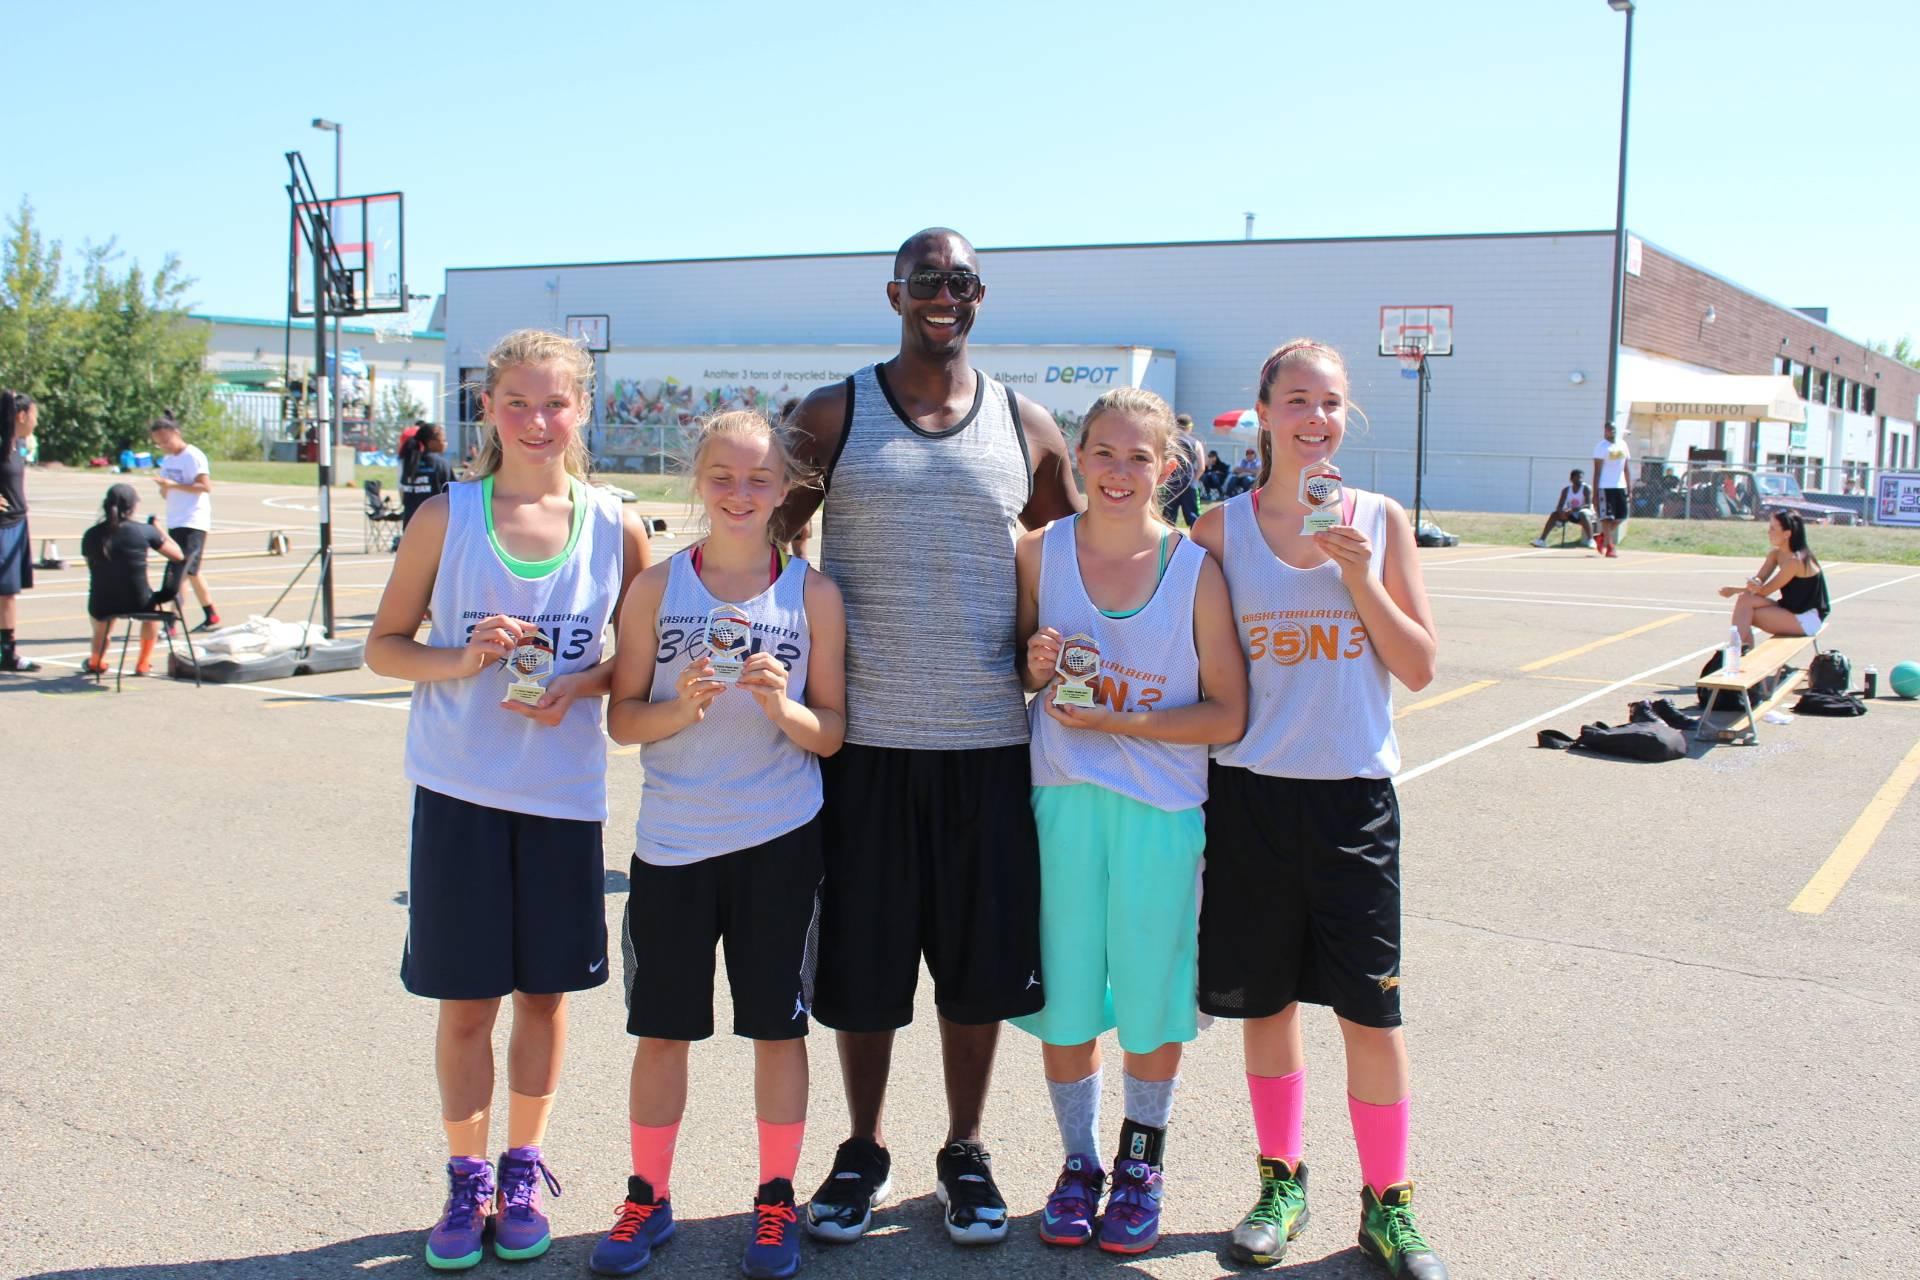 13-15yrs Old Girls Champions: Triple Threat